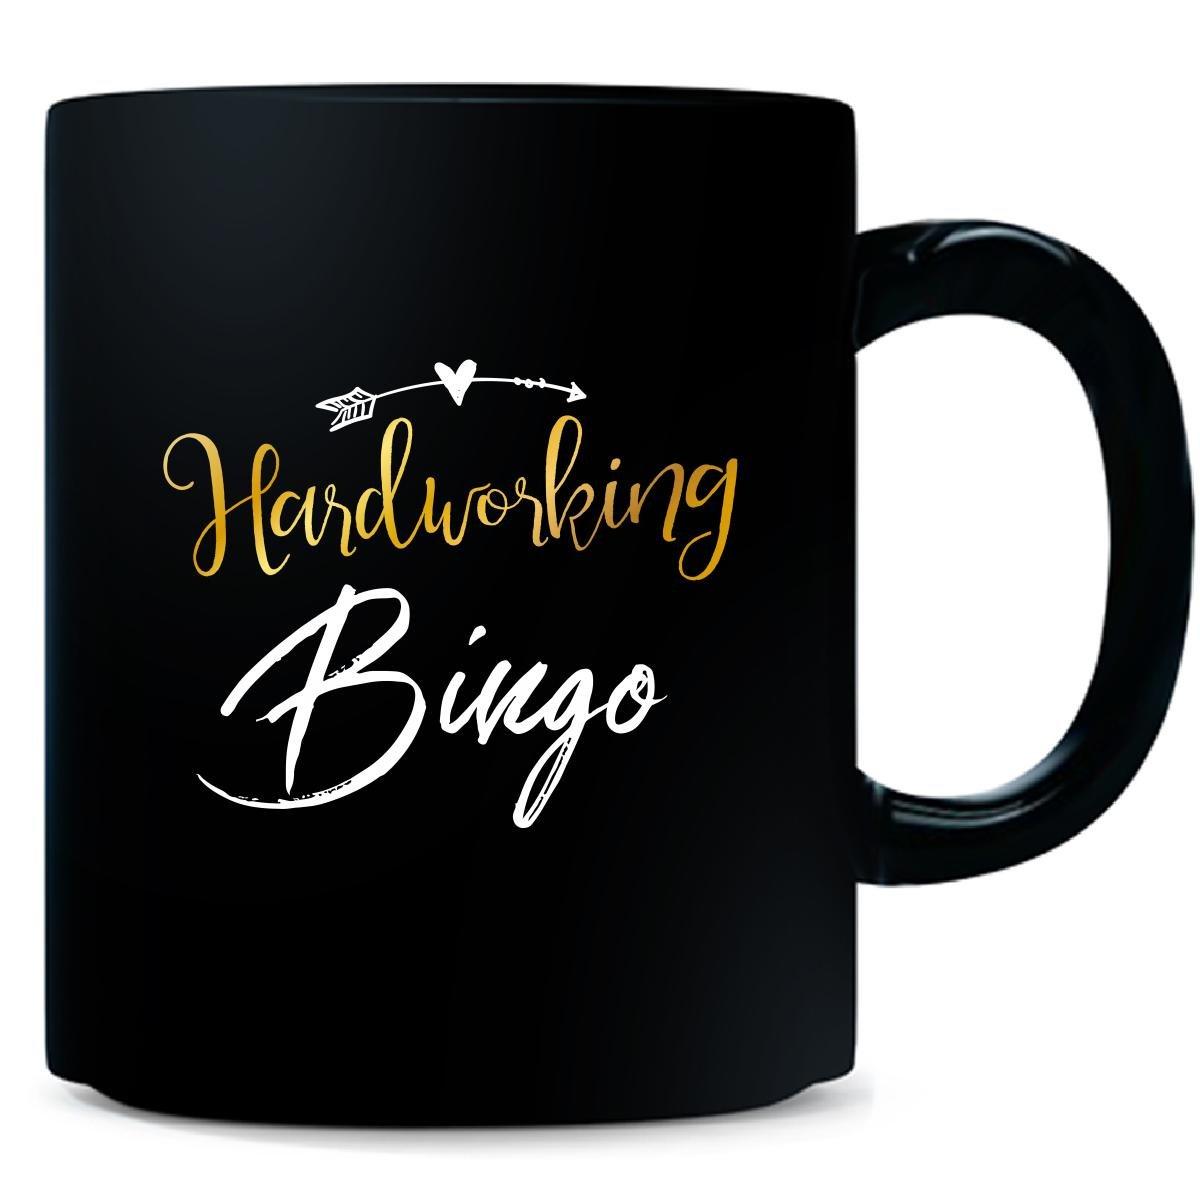 Hardworking Bingo Name Mothers Day Present Grandma - Mug by My Family Tee